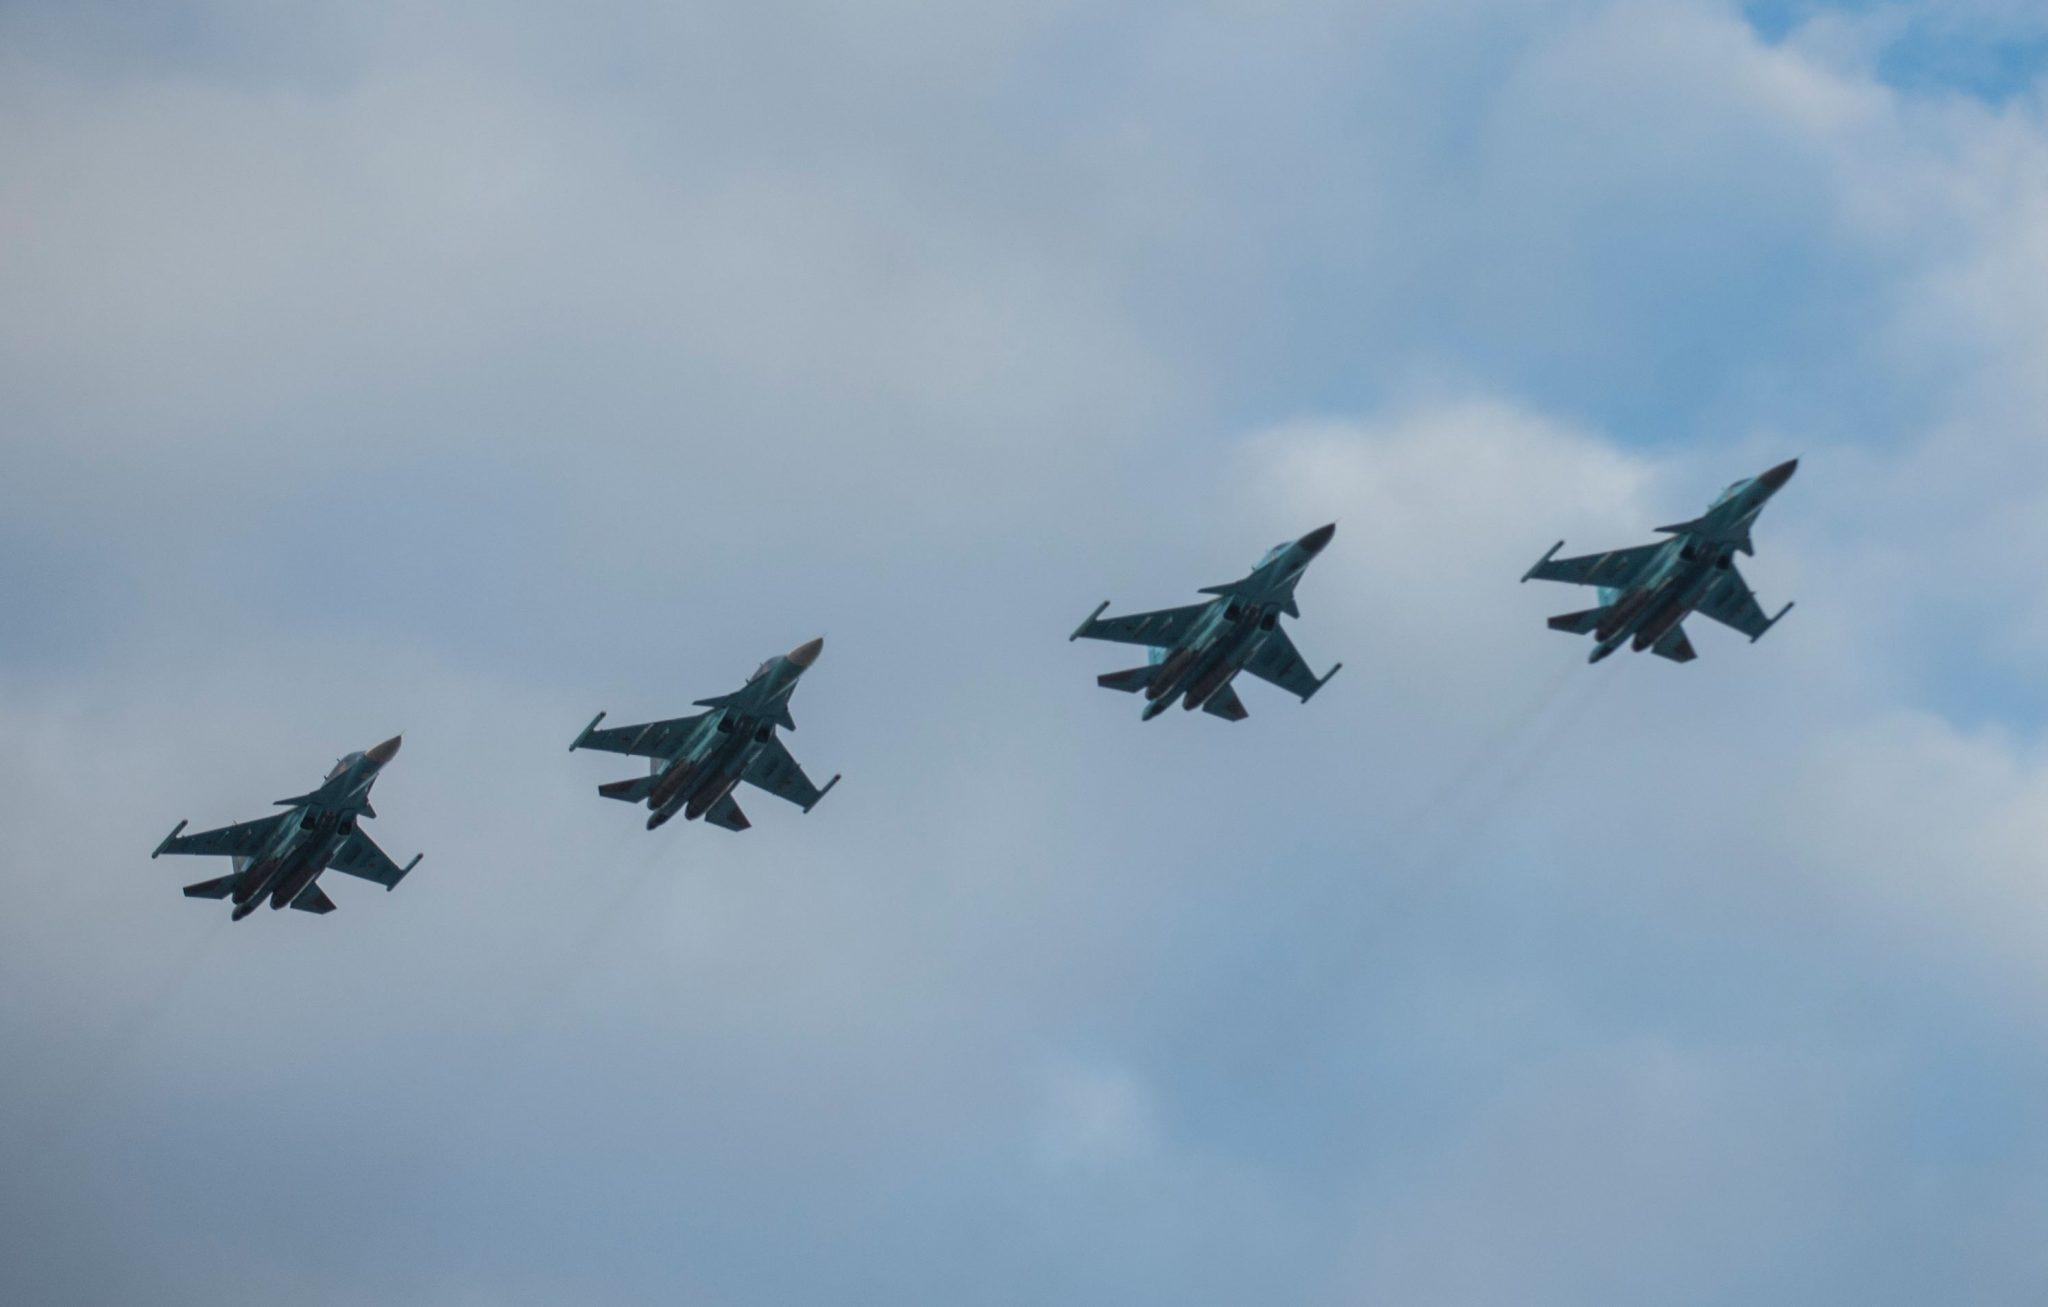 Spionajul ucrainean: Rusia a dislocat circa 500 de avioane militare la granița cu Ucraina